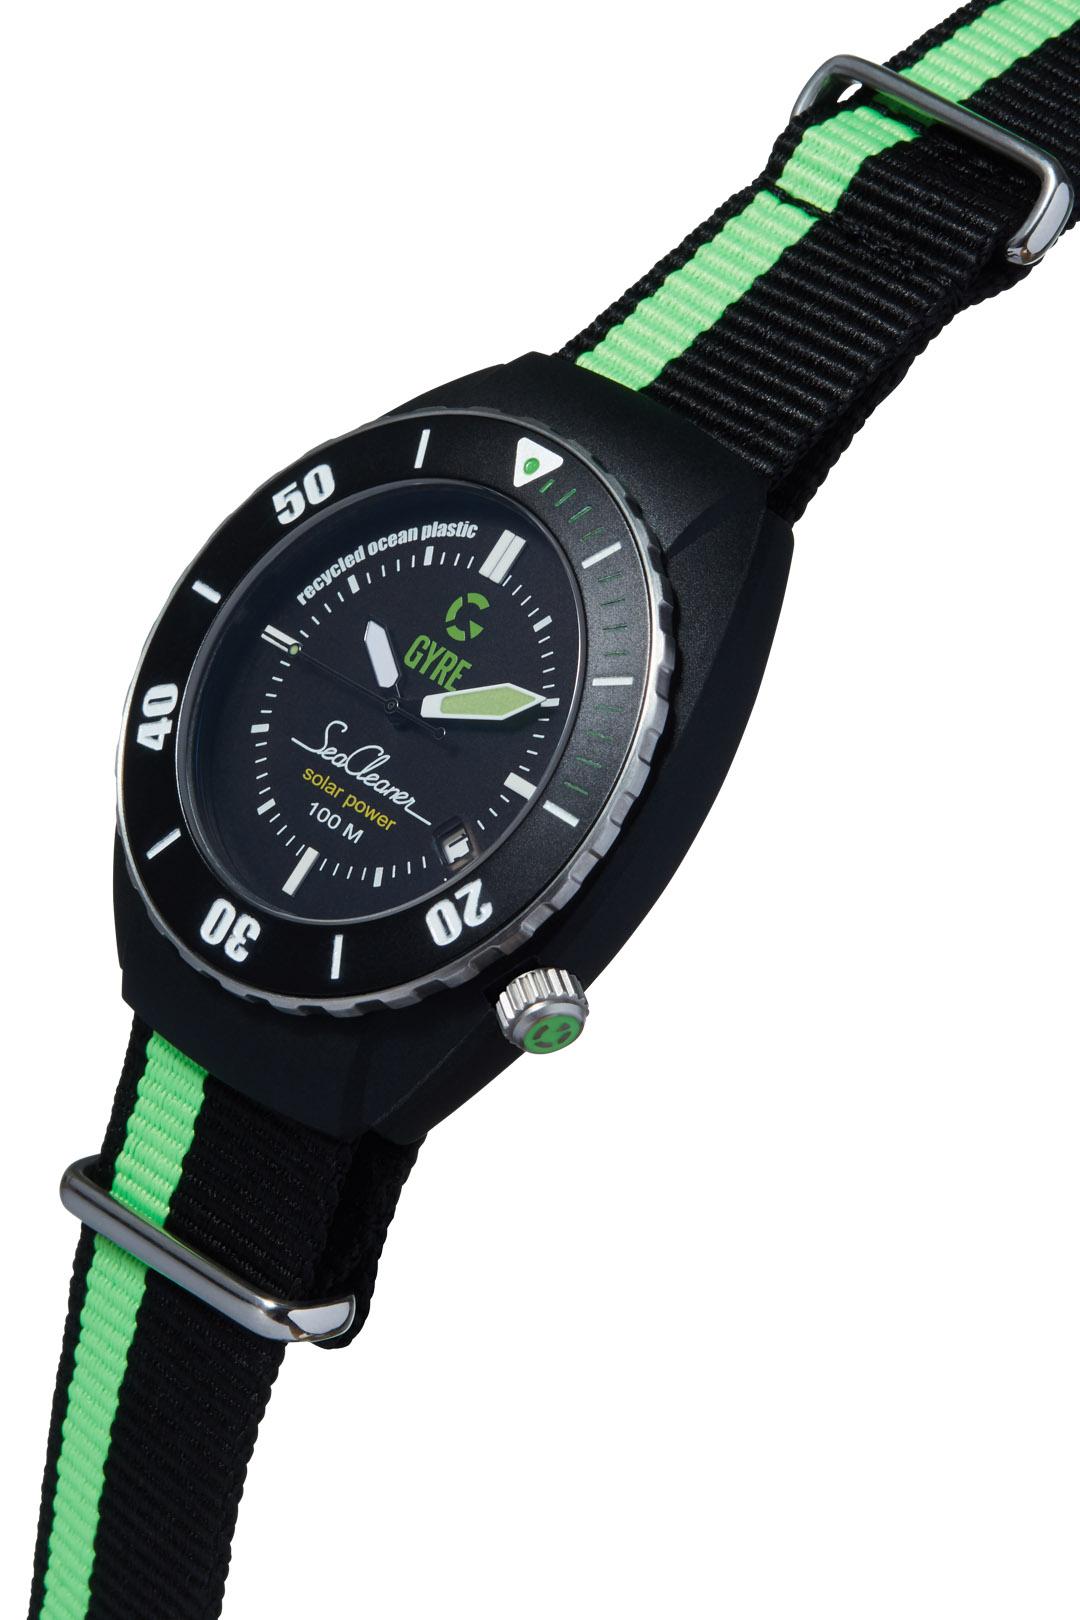 Gyre Watch SeaCleaner